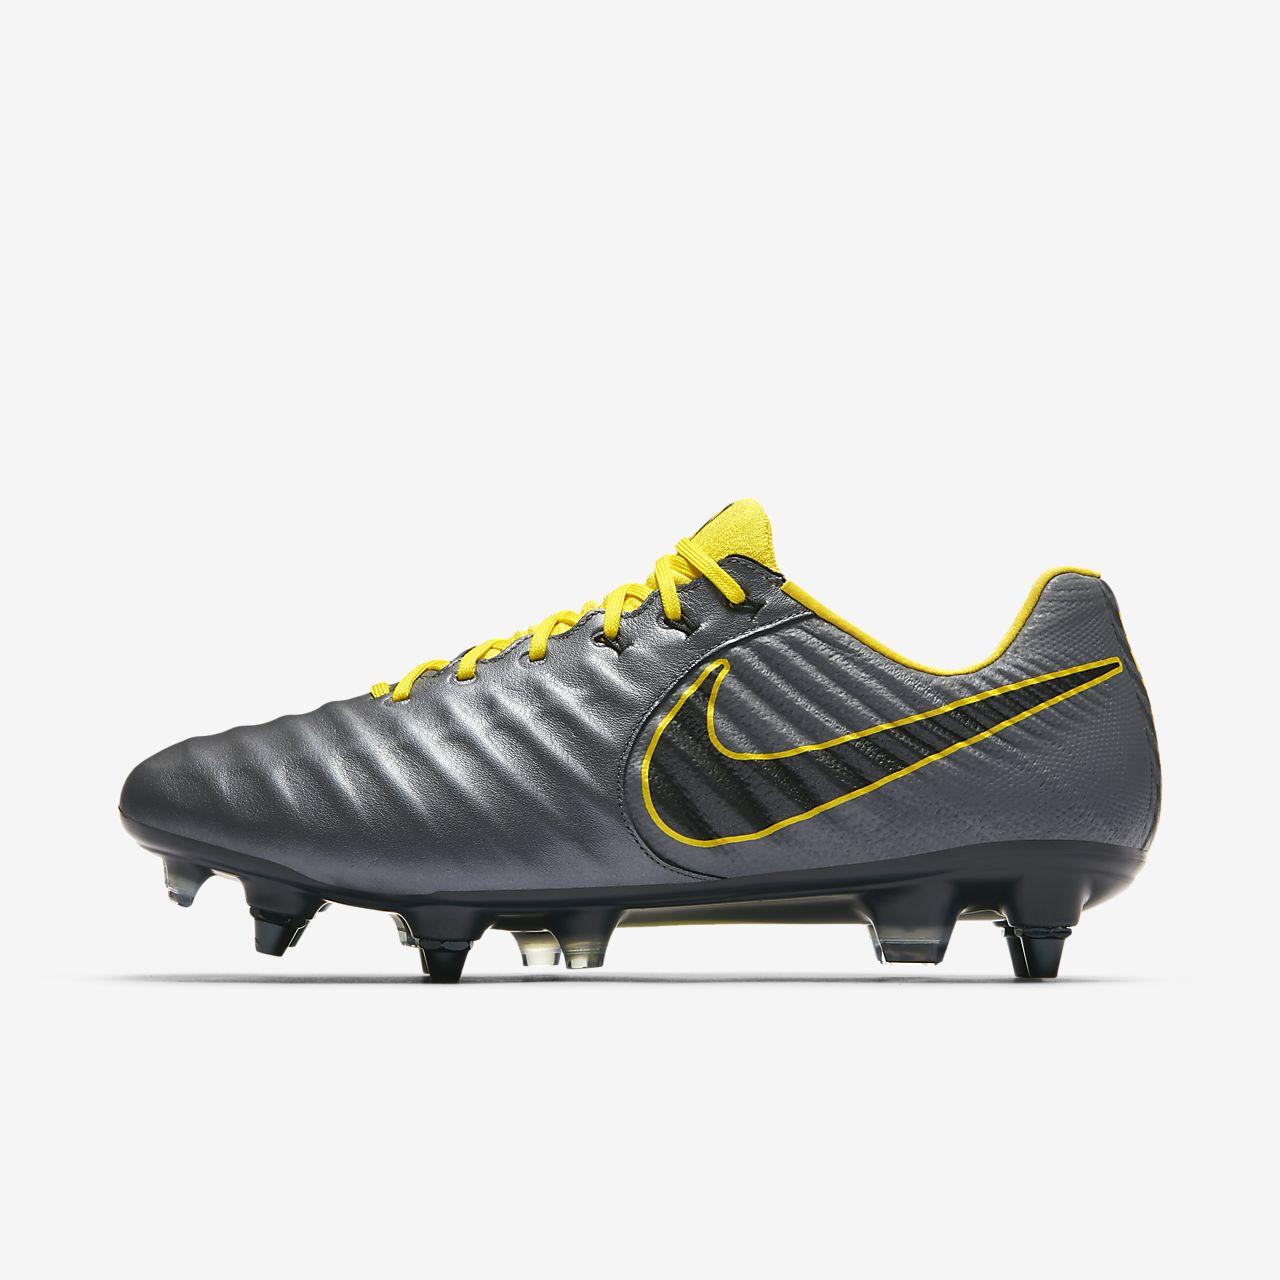 9e39dc3985403 ... Nike Tiempo Legend VII Elite SG-Pro Anti-Clog Botas de fútbol para  terreno